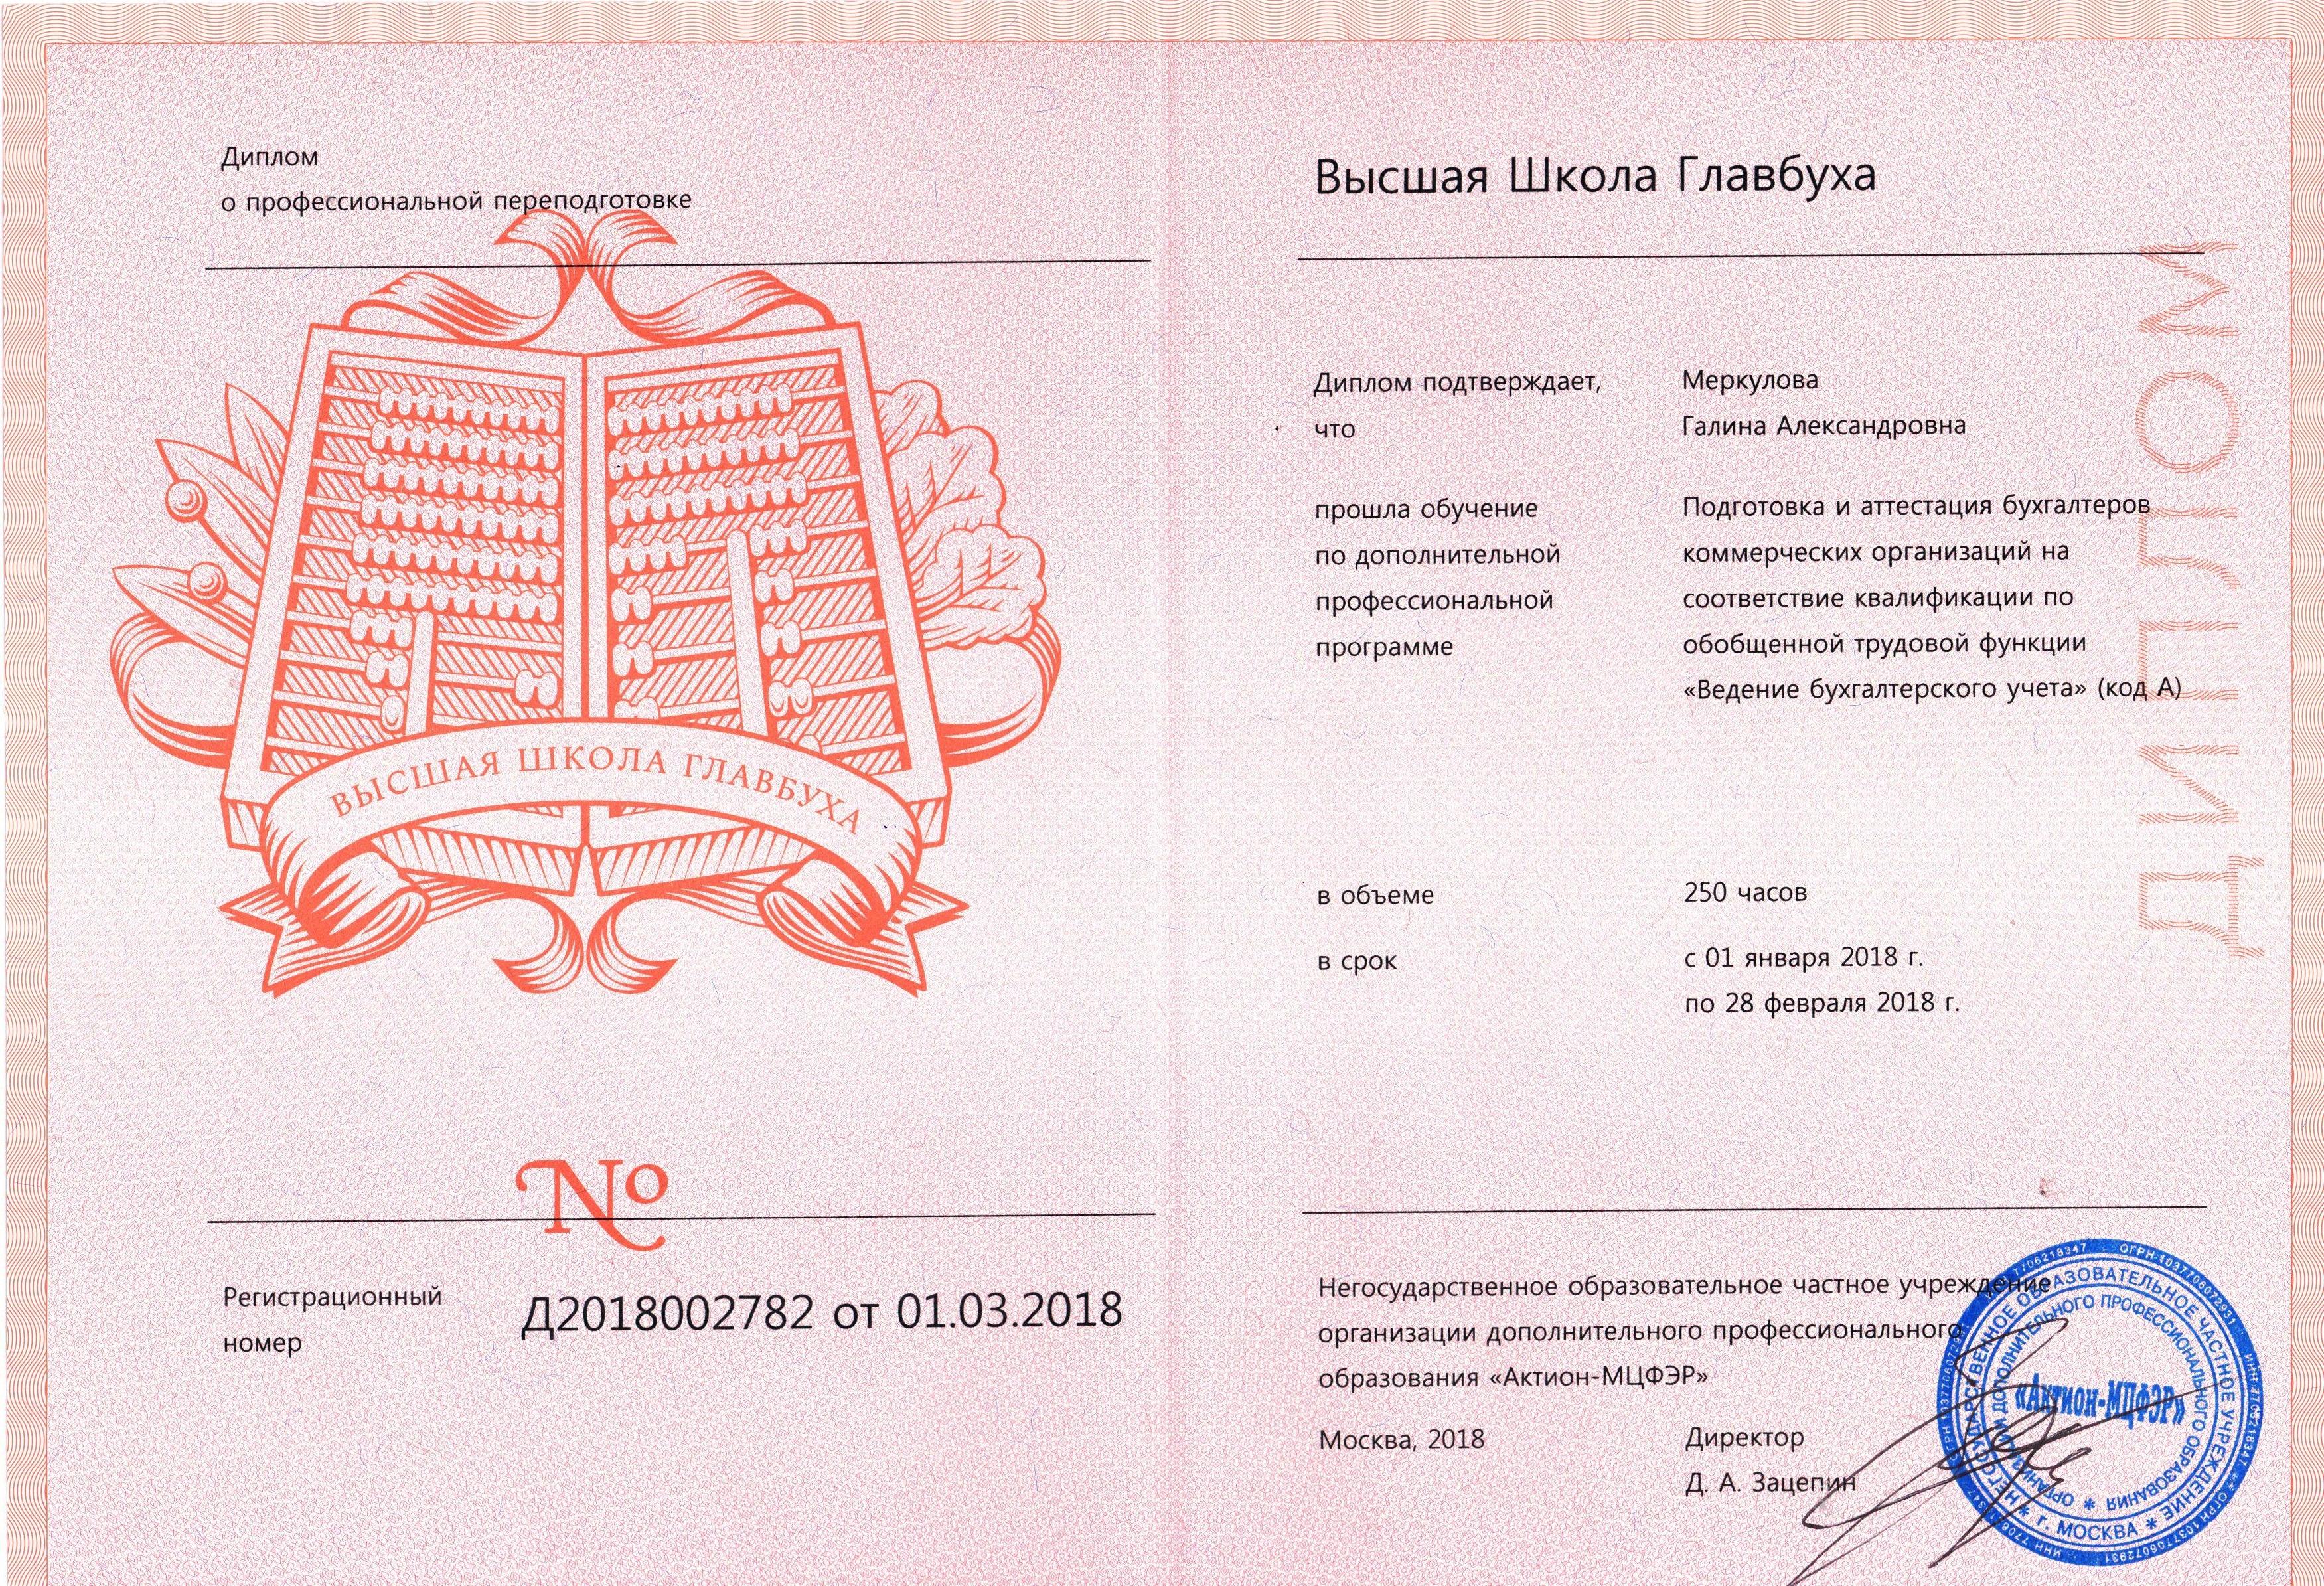 http://www.konsaltingpremium.ru/wp-content/uploads/2018/09/20180413_162904.jpg